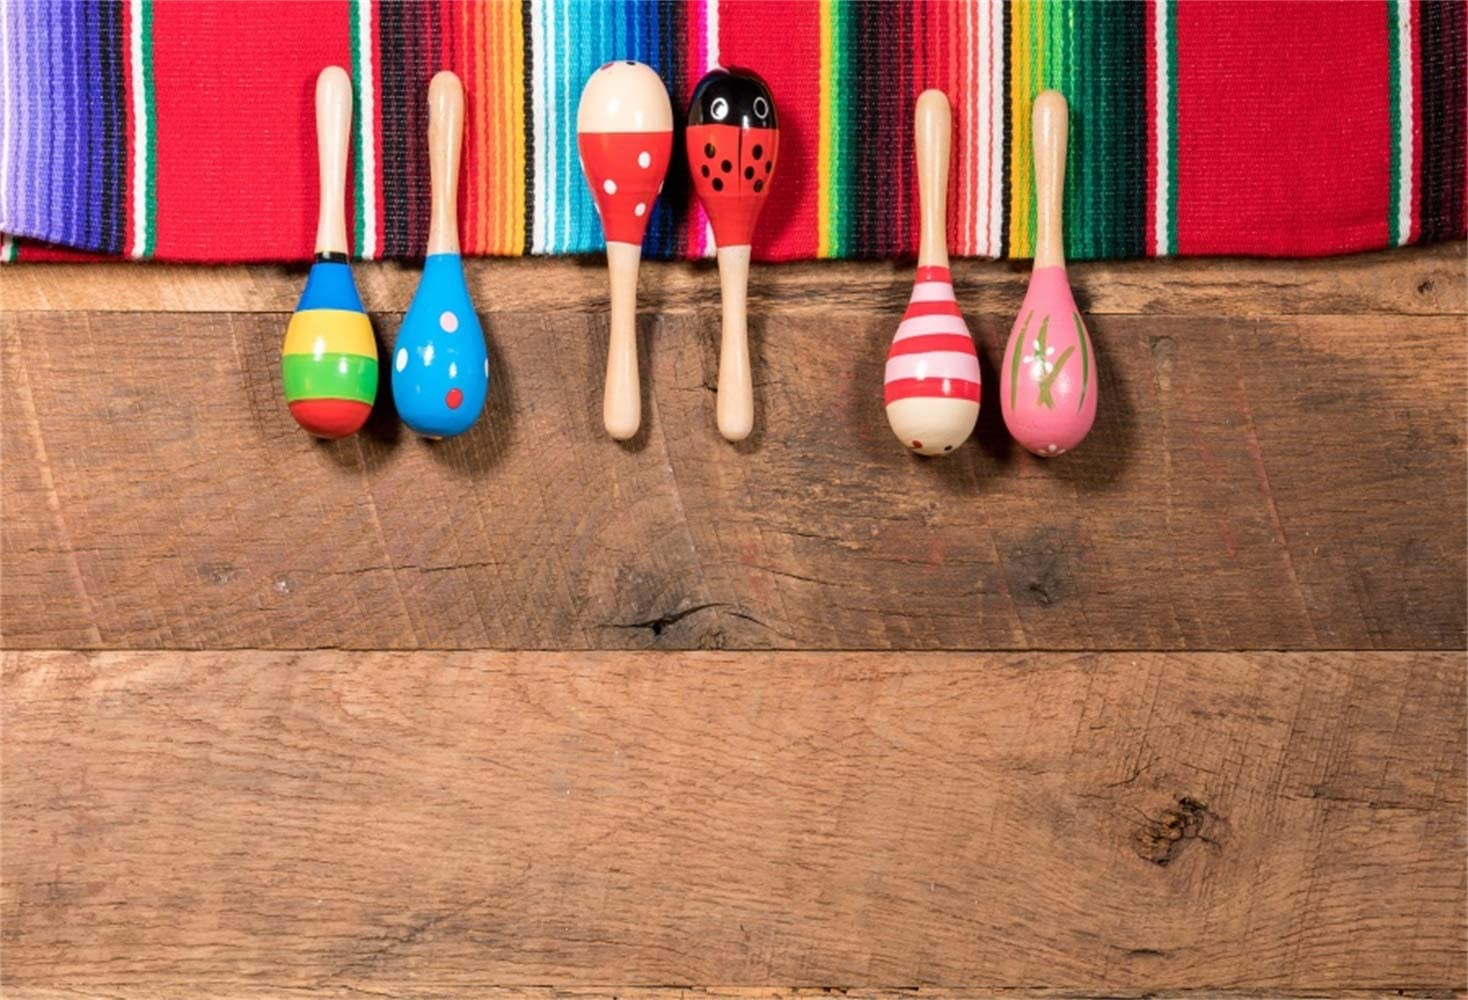 Leowefowa Maracas Serape Rustic Wood Board Backdrop 10x8ft Mexican Fiesta Party Vinyl Photography Background Child Kids Baby Photo Shoot Craft Show Background